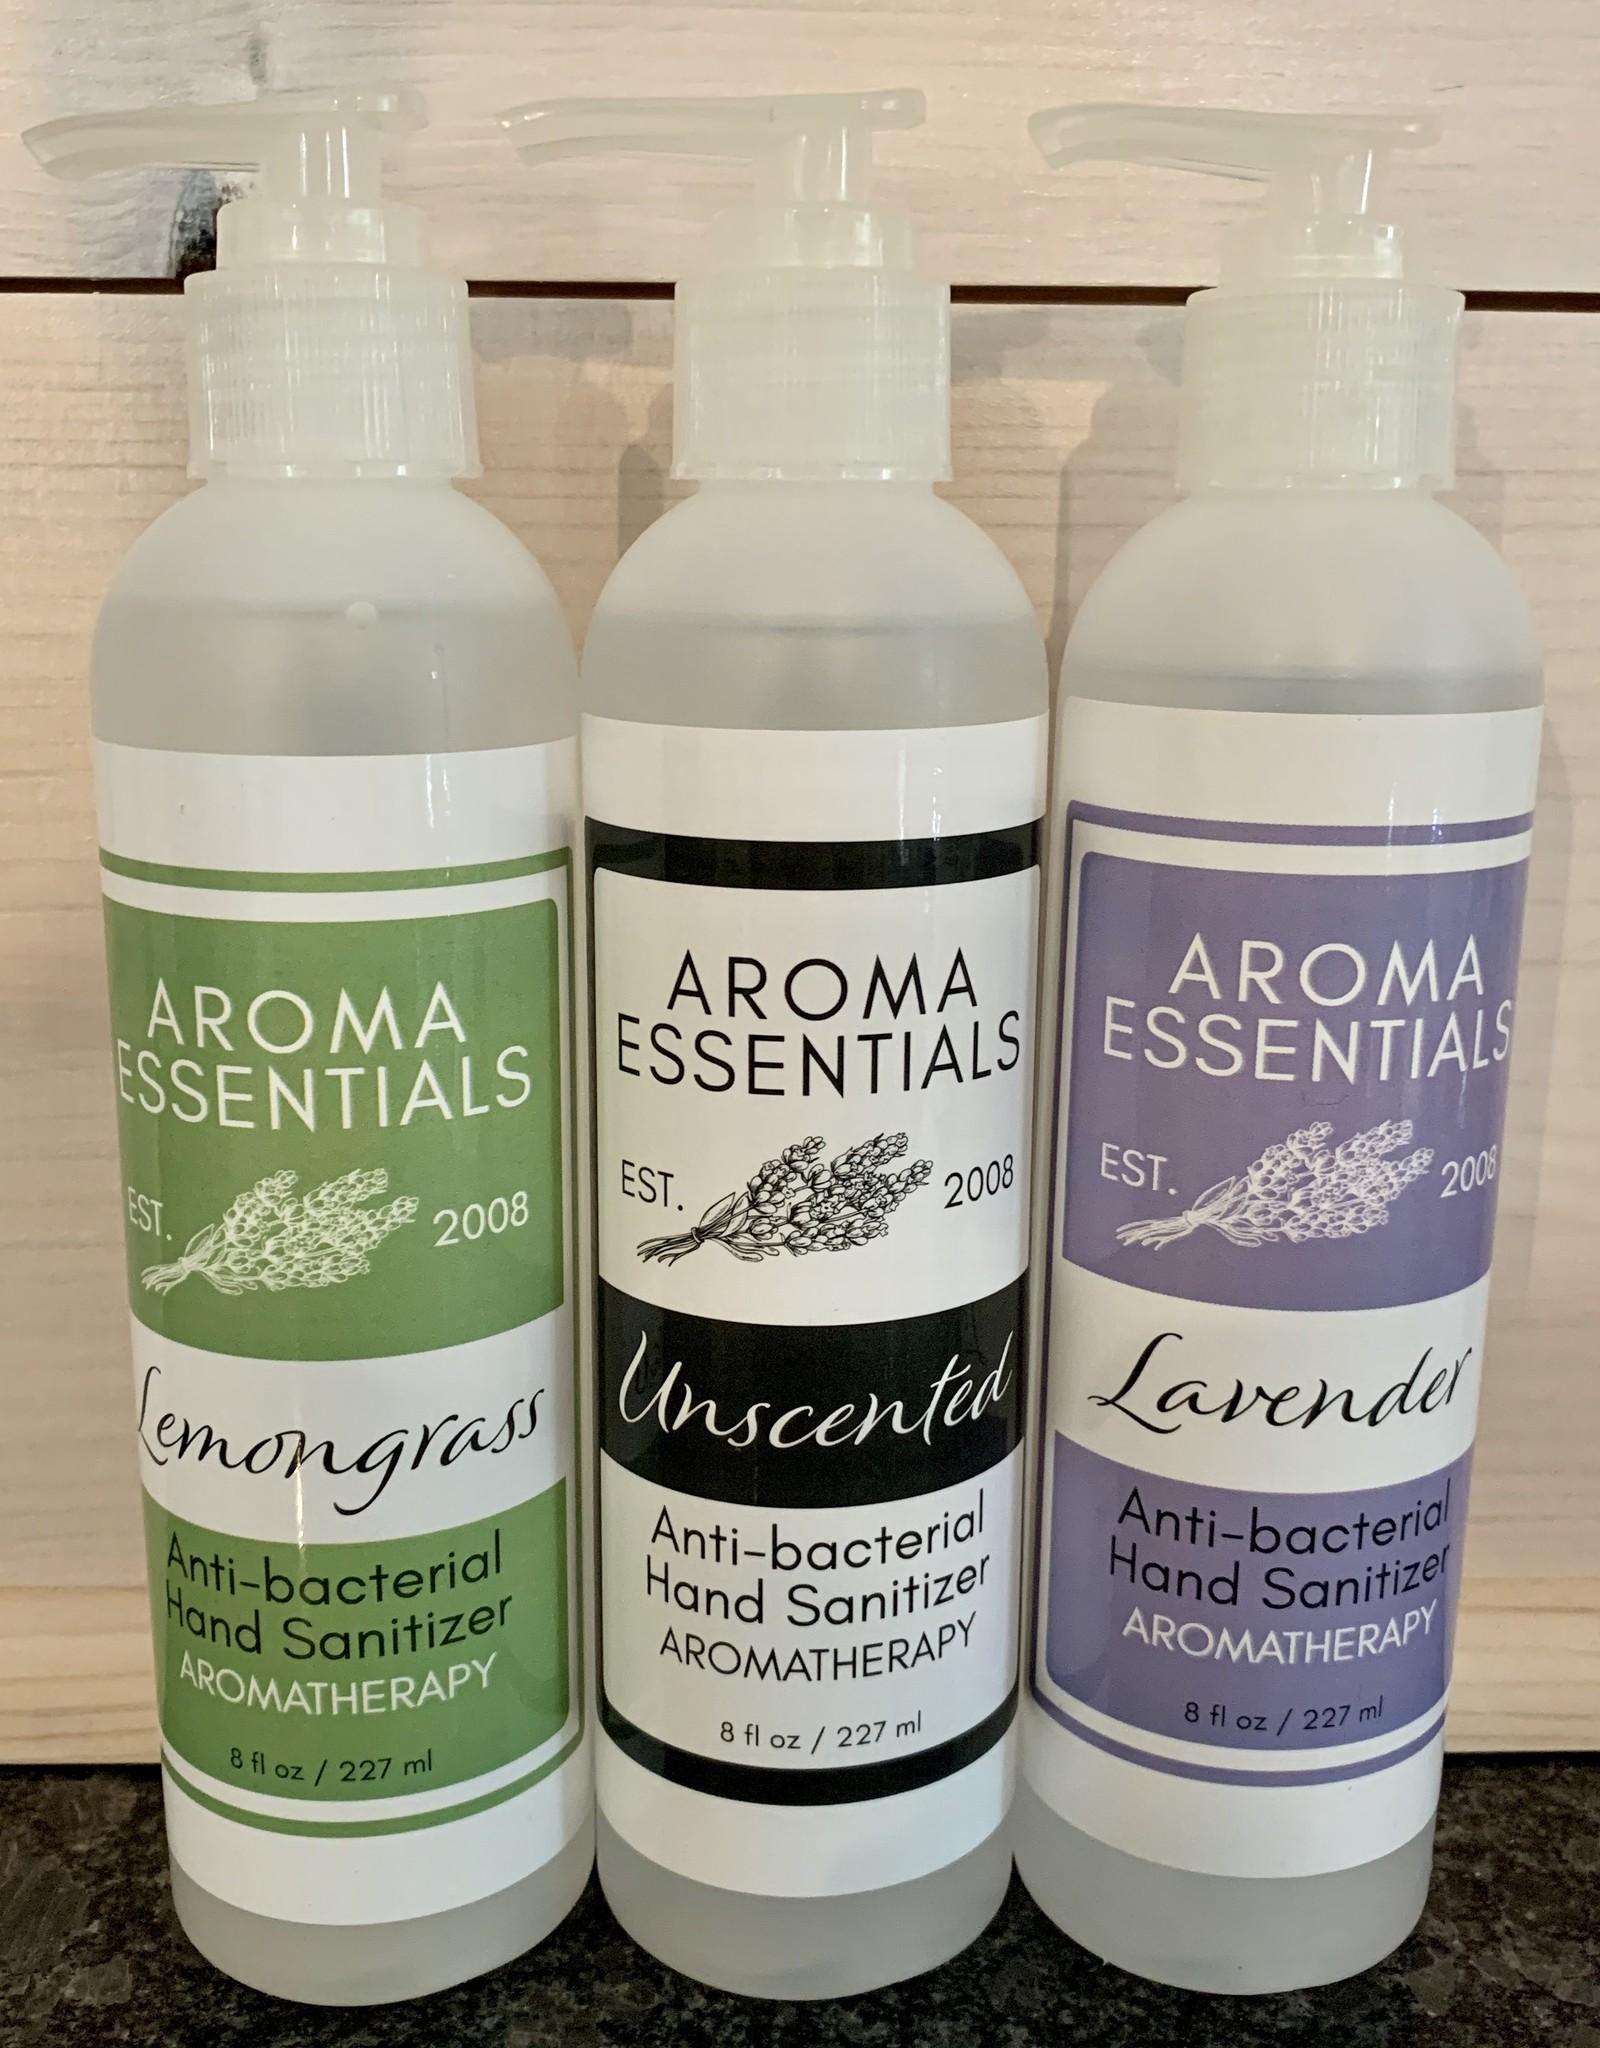 Soy Essentials Soy Essentials - Hand Sanitizer Unscented